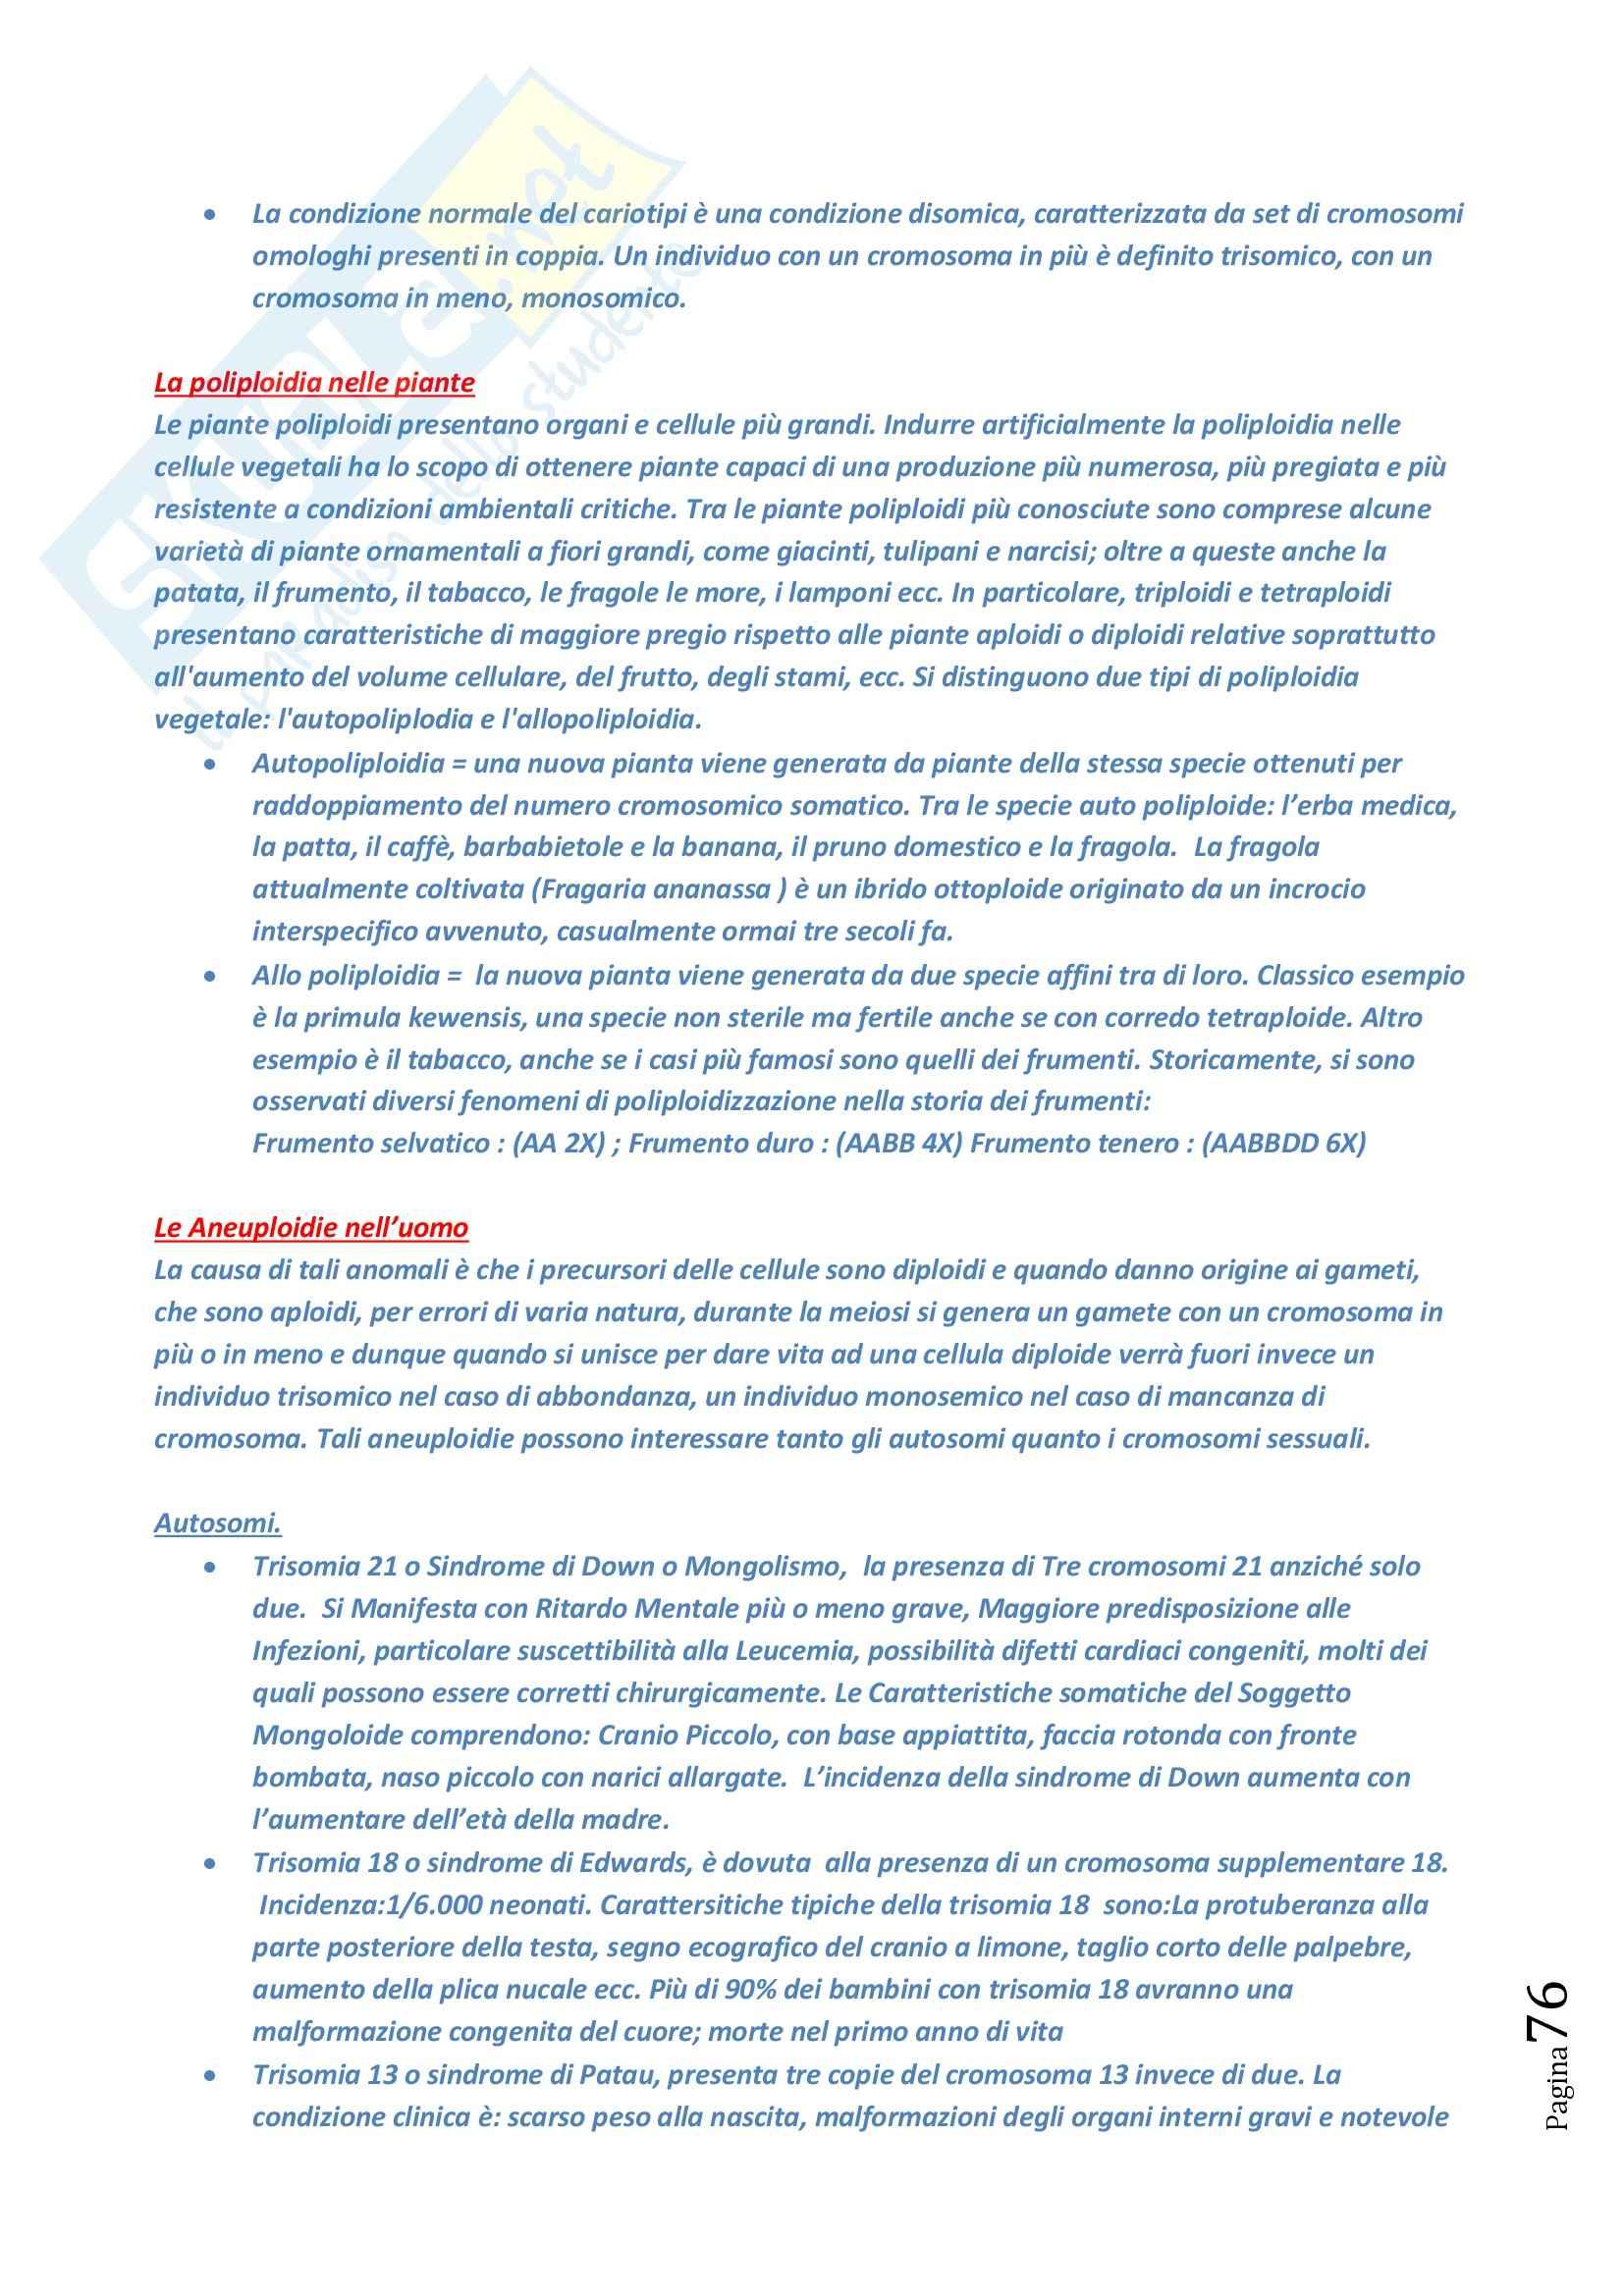 Lezioni, Biologia Animale e Vegetale Pag. 76